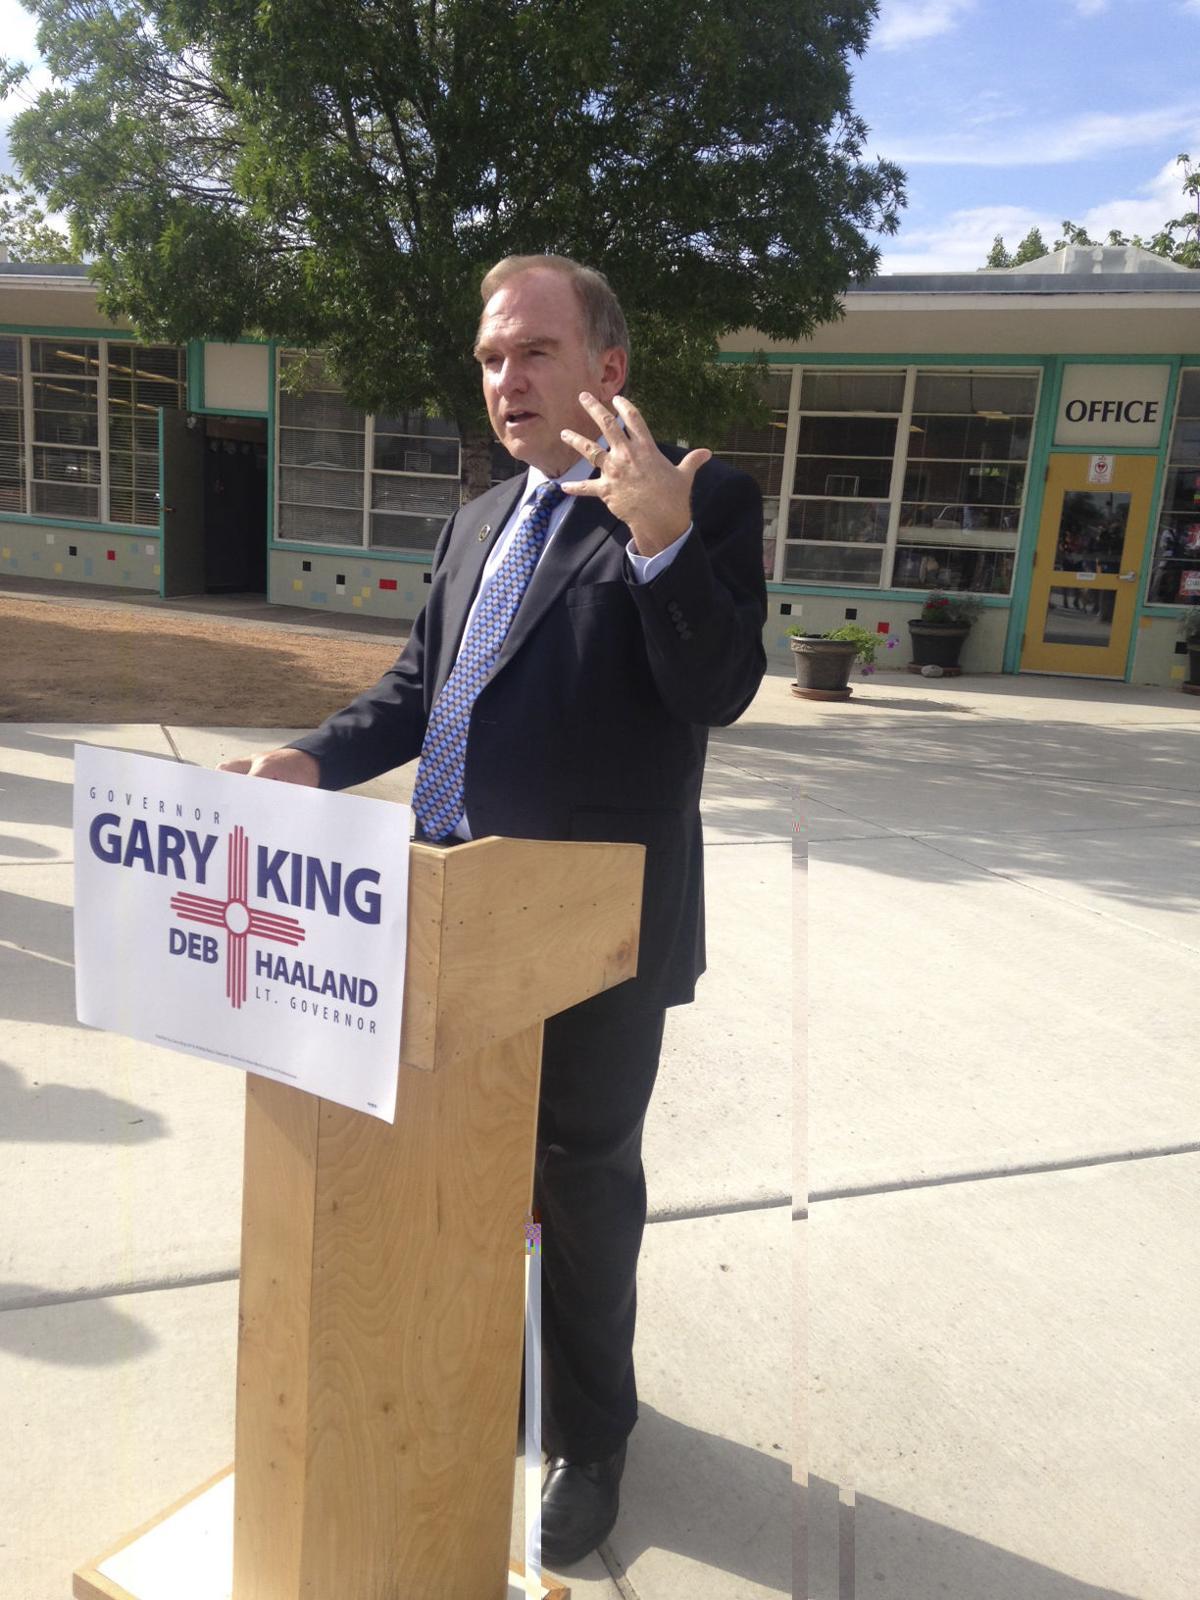 Gary King: Fire Skandera, reduce school testing